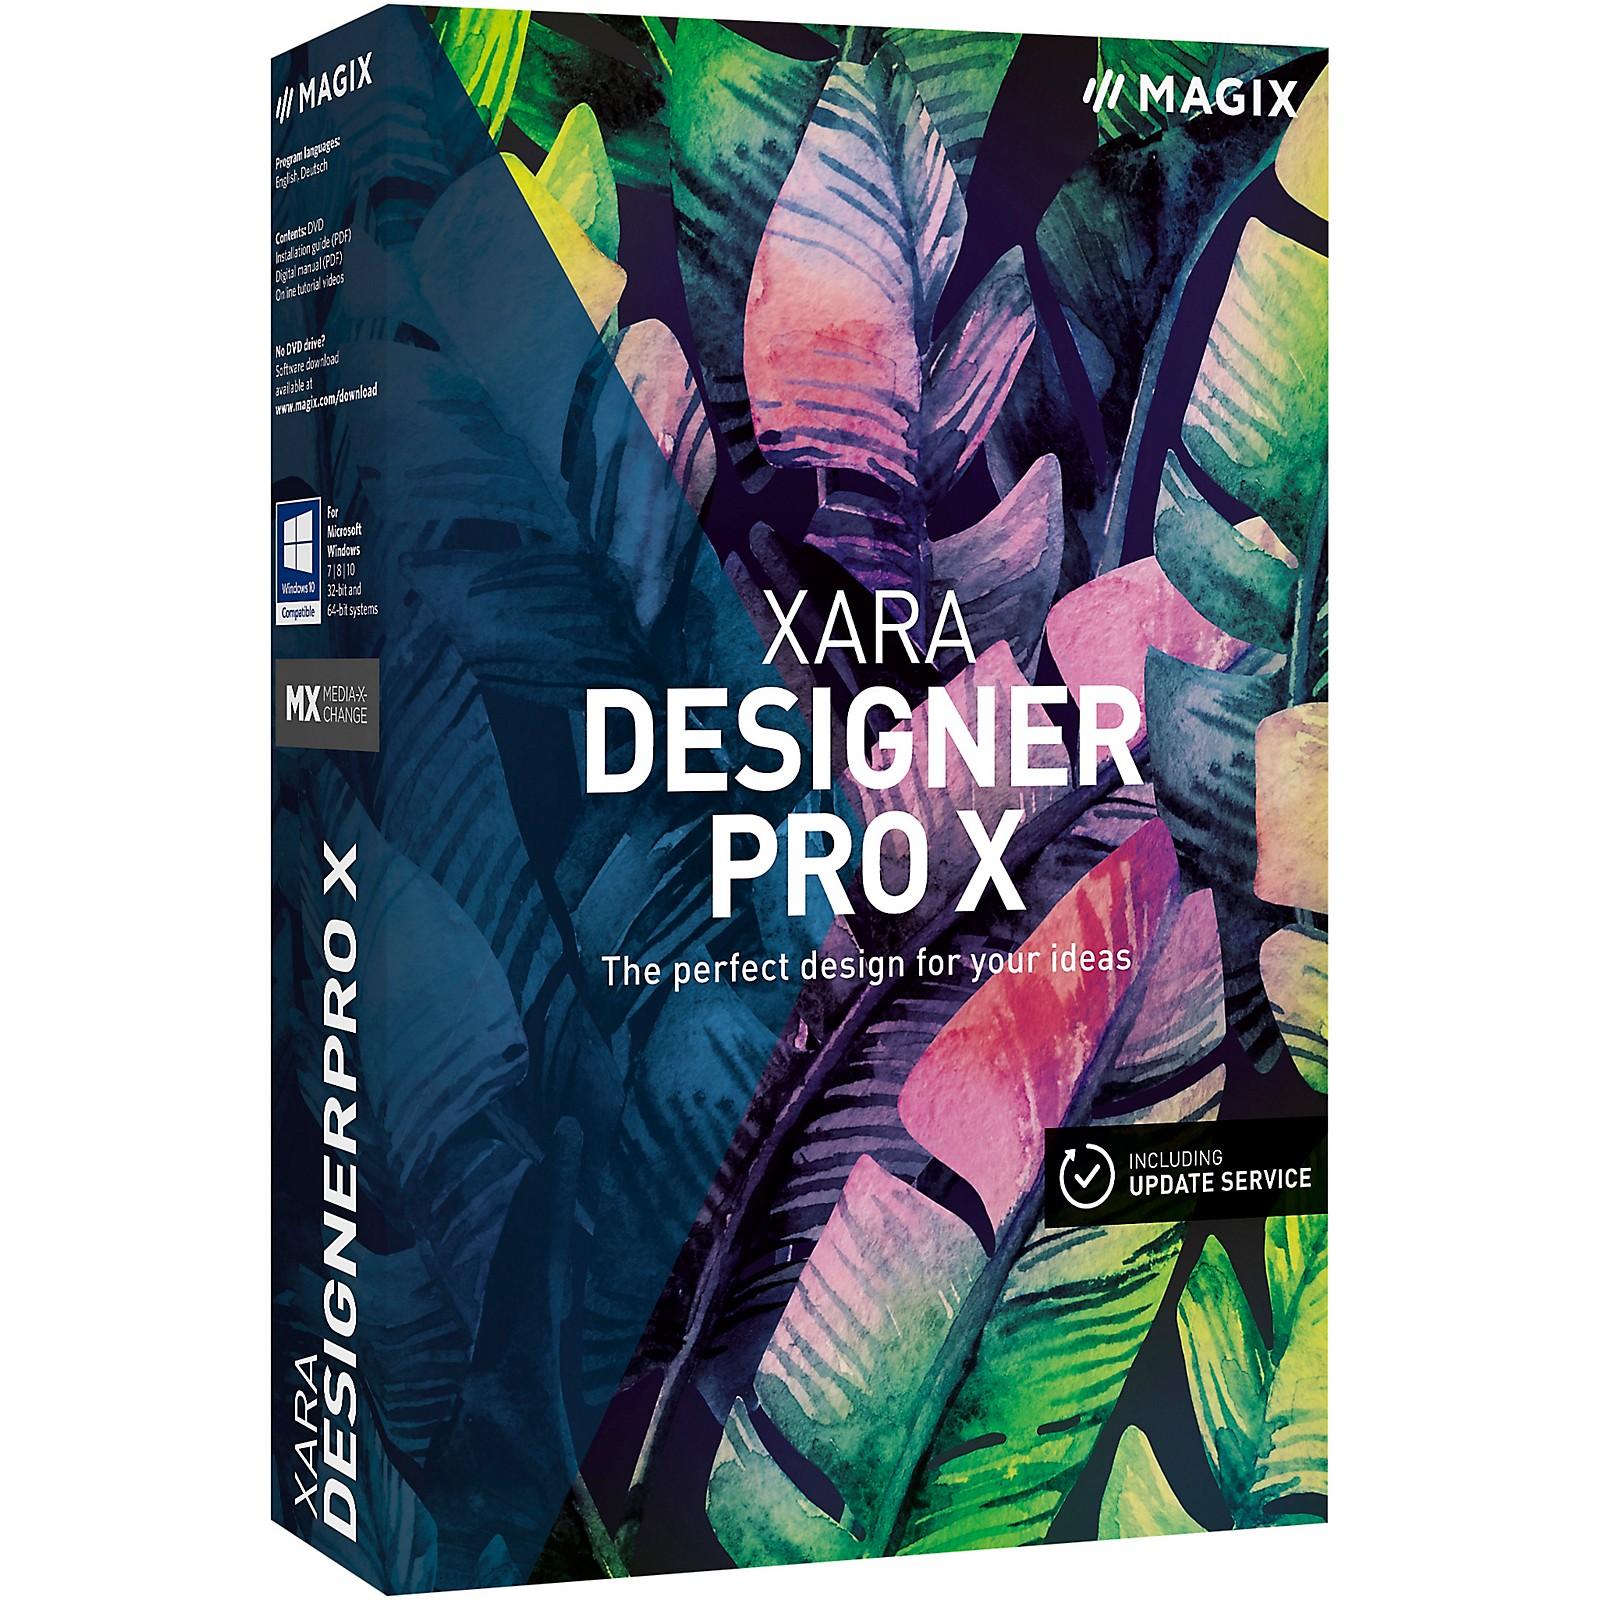 Magix Xara Designer Pro X